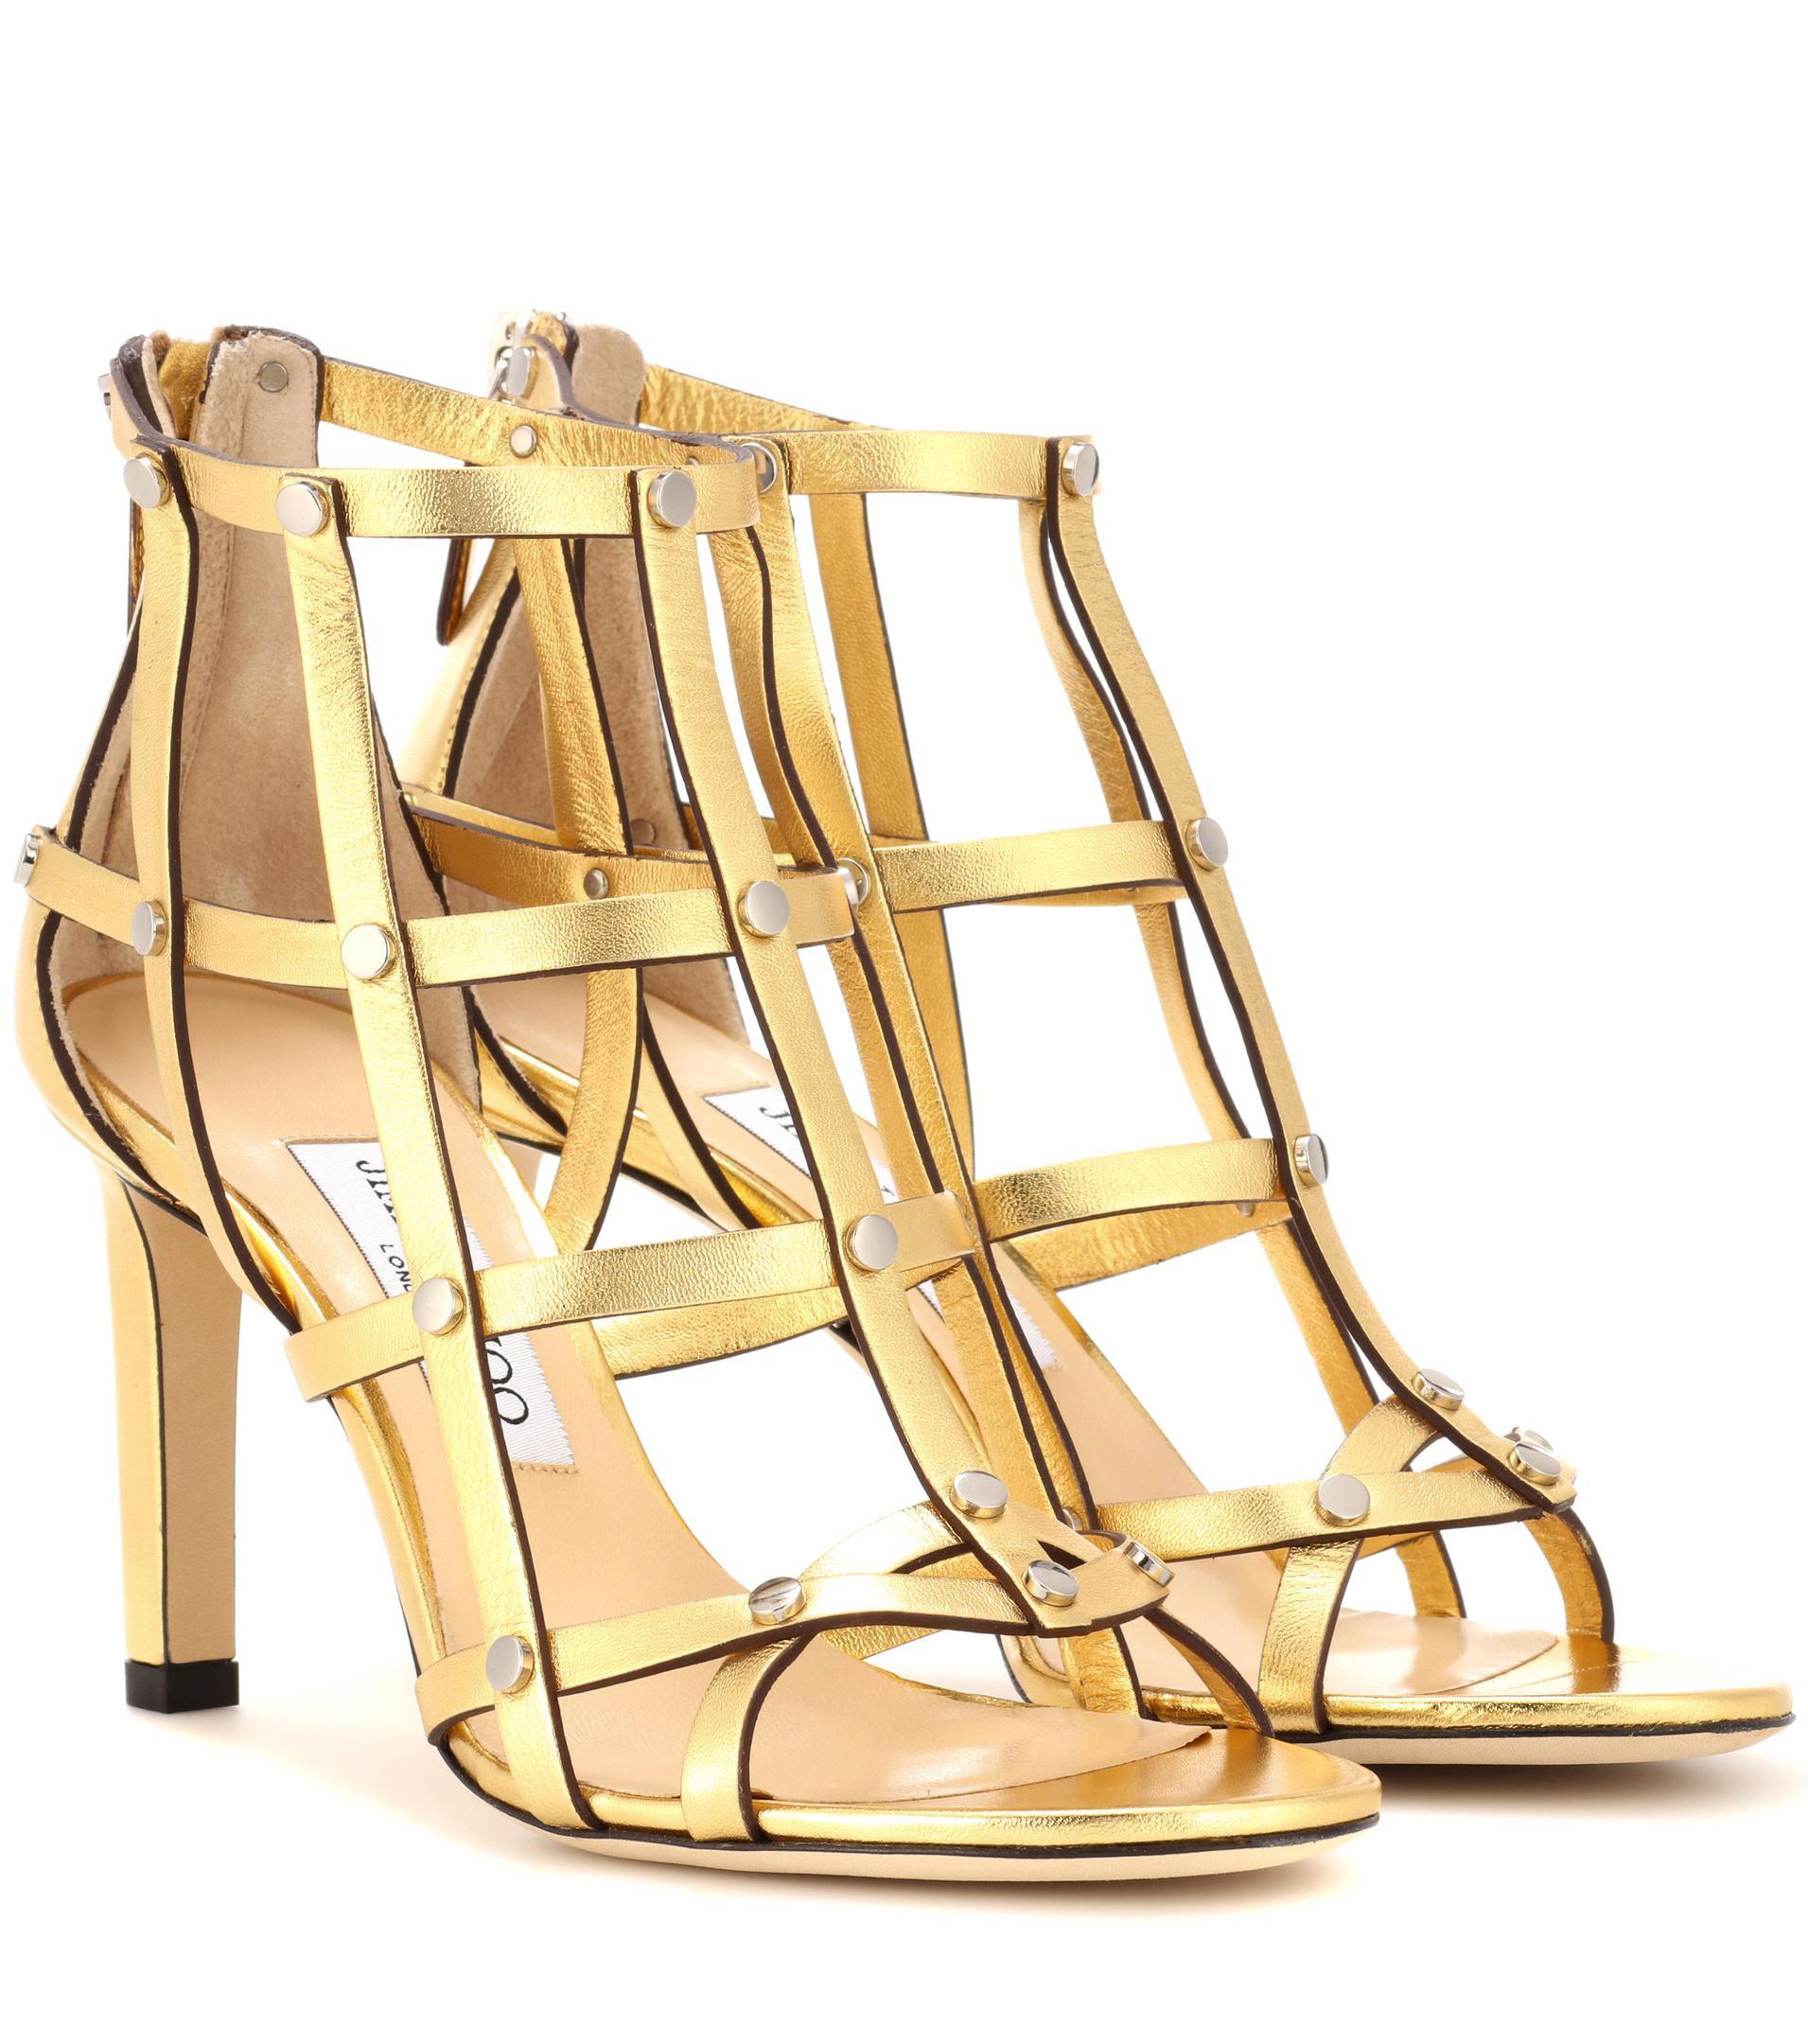 4fa6231f48a Jimmy Choo Tina 85 Metallic Leather Sandals in Metallic - Lyst